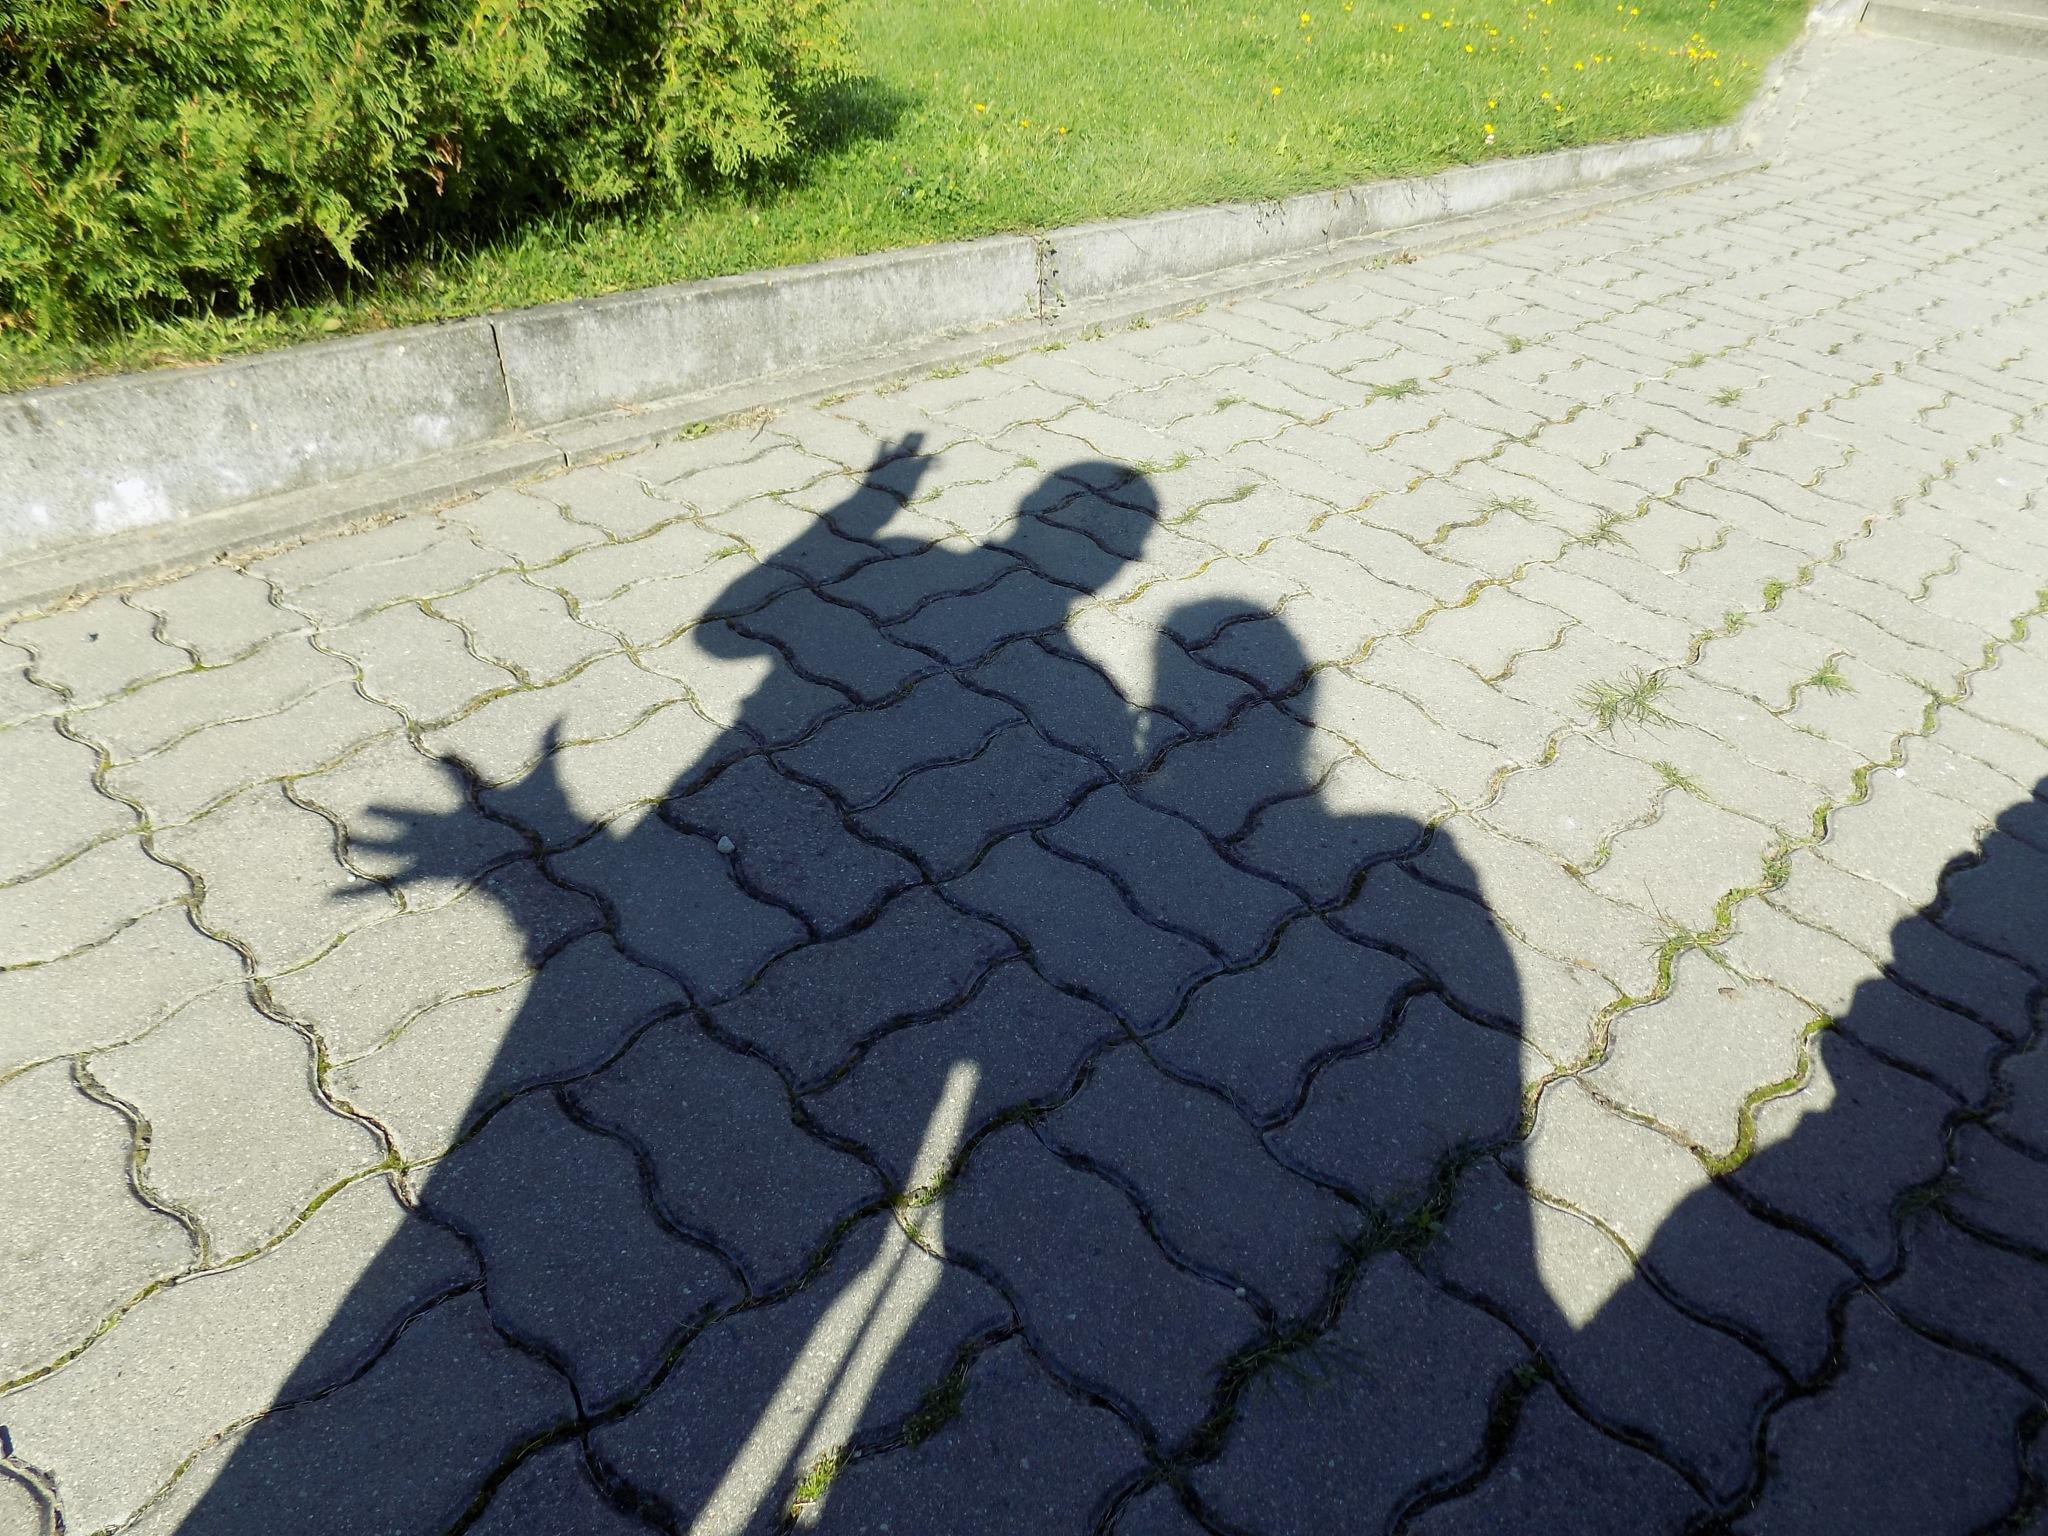 Shadows by uzkuraitiene62